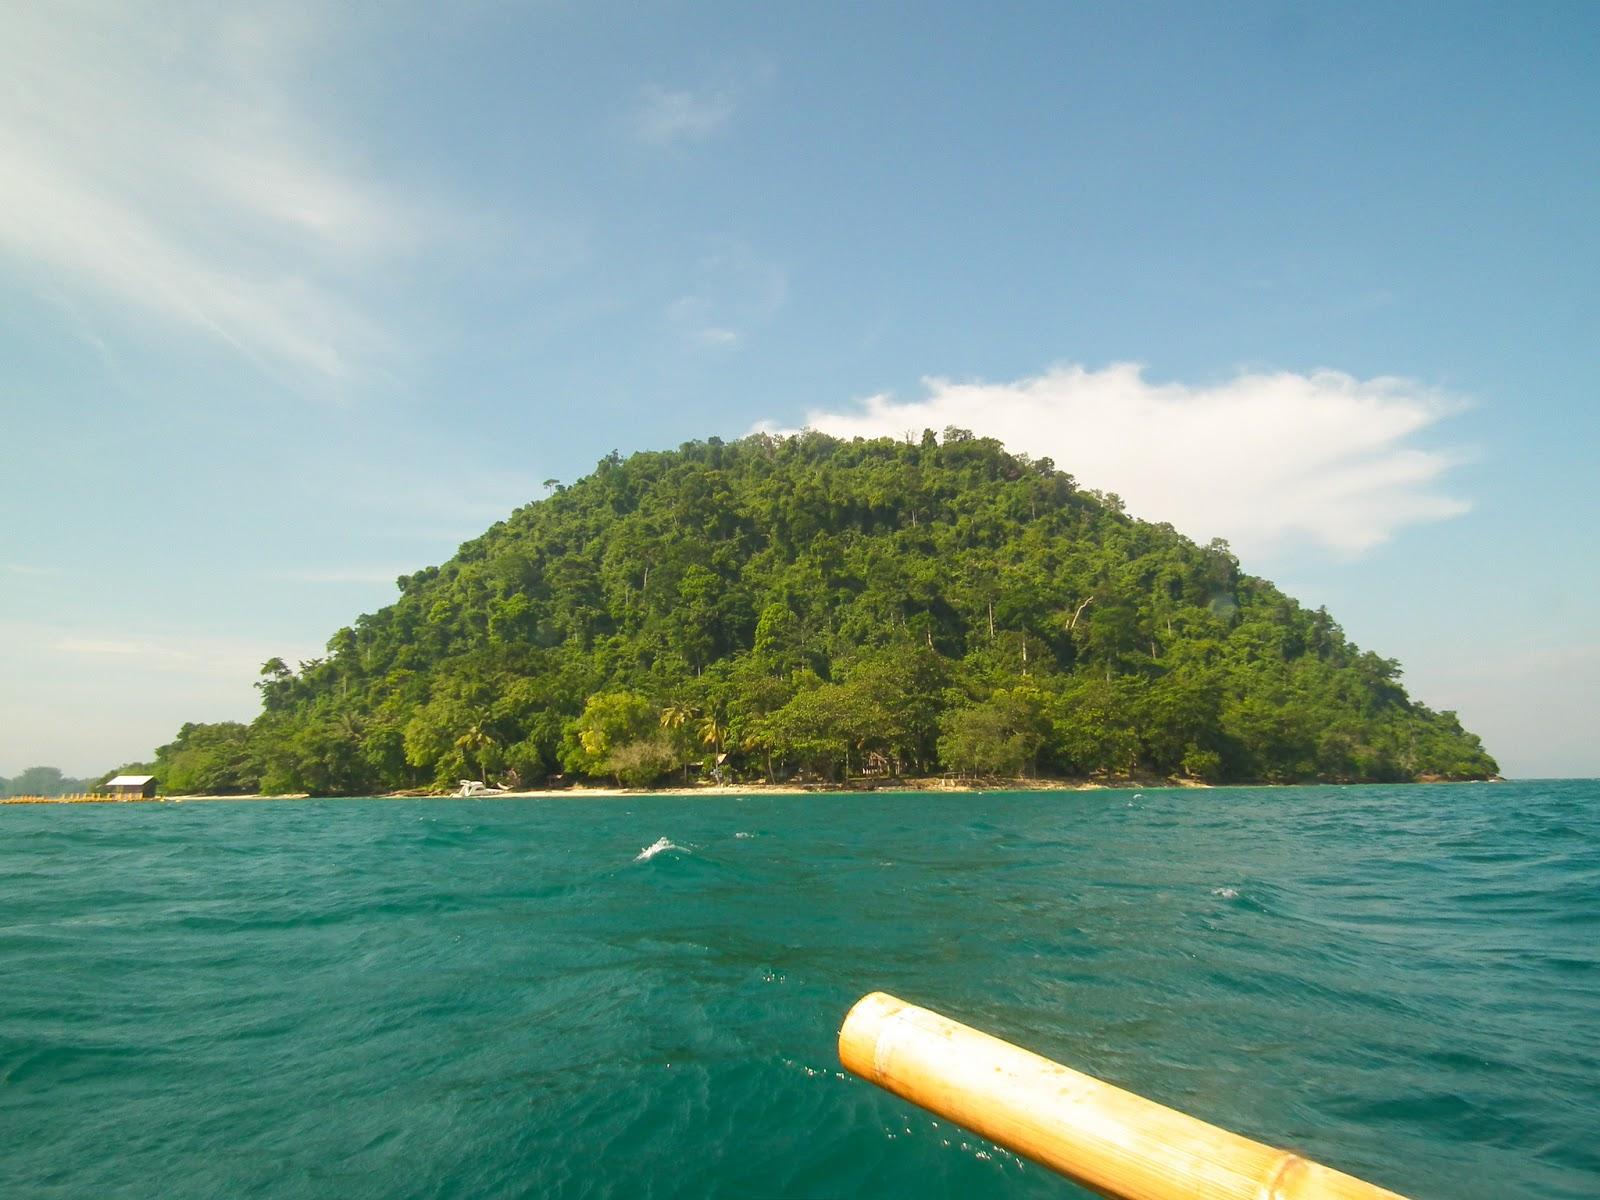 Pulau Condong Hamparan Pasir Putih Yang Asri Di Lampung Lampung